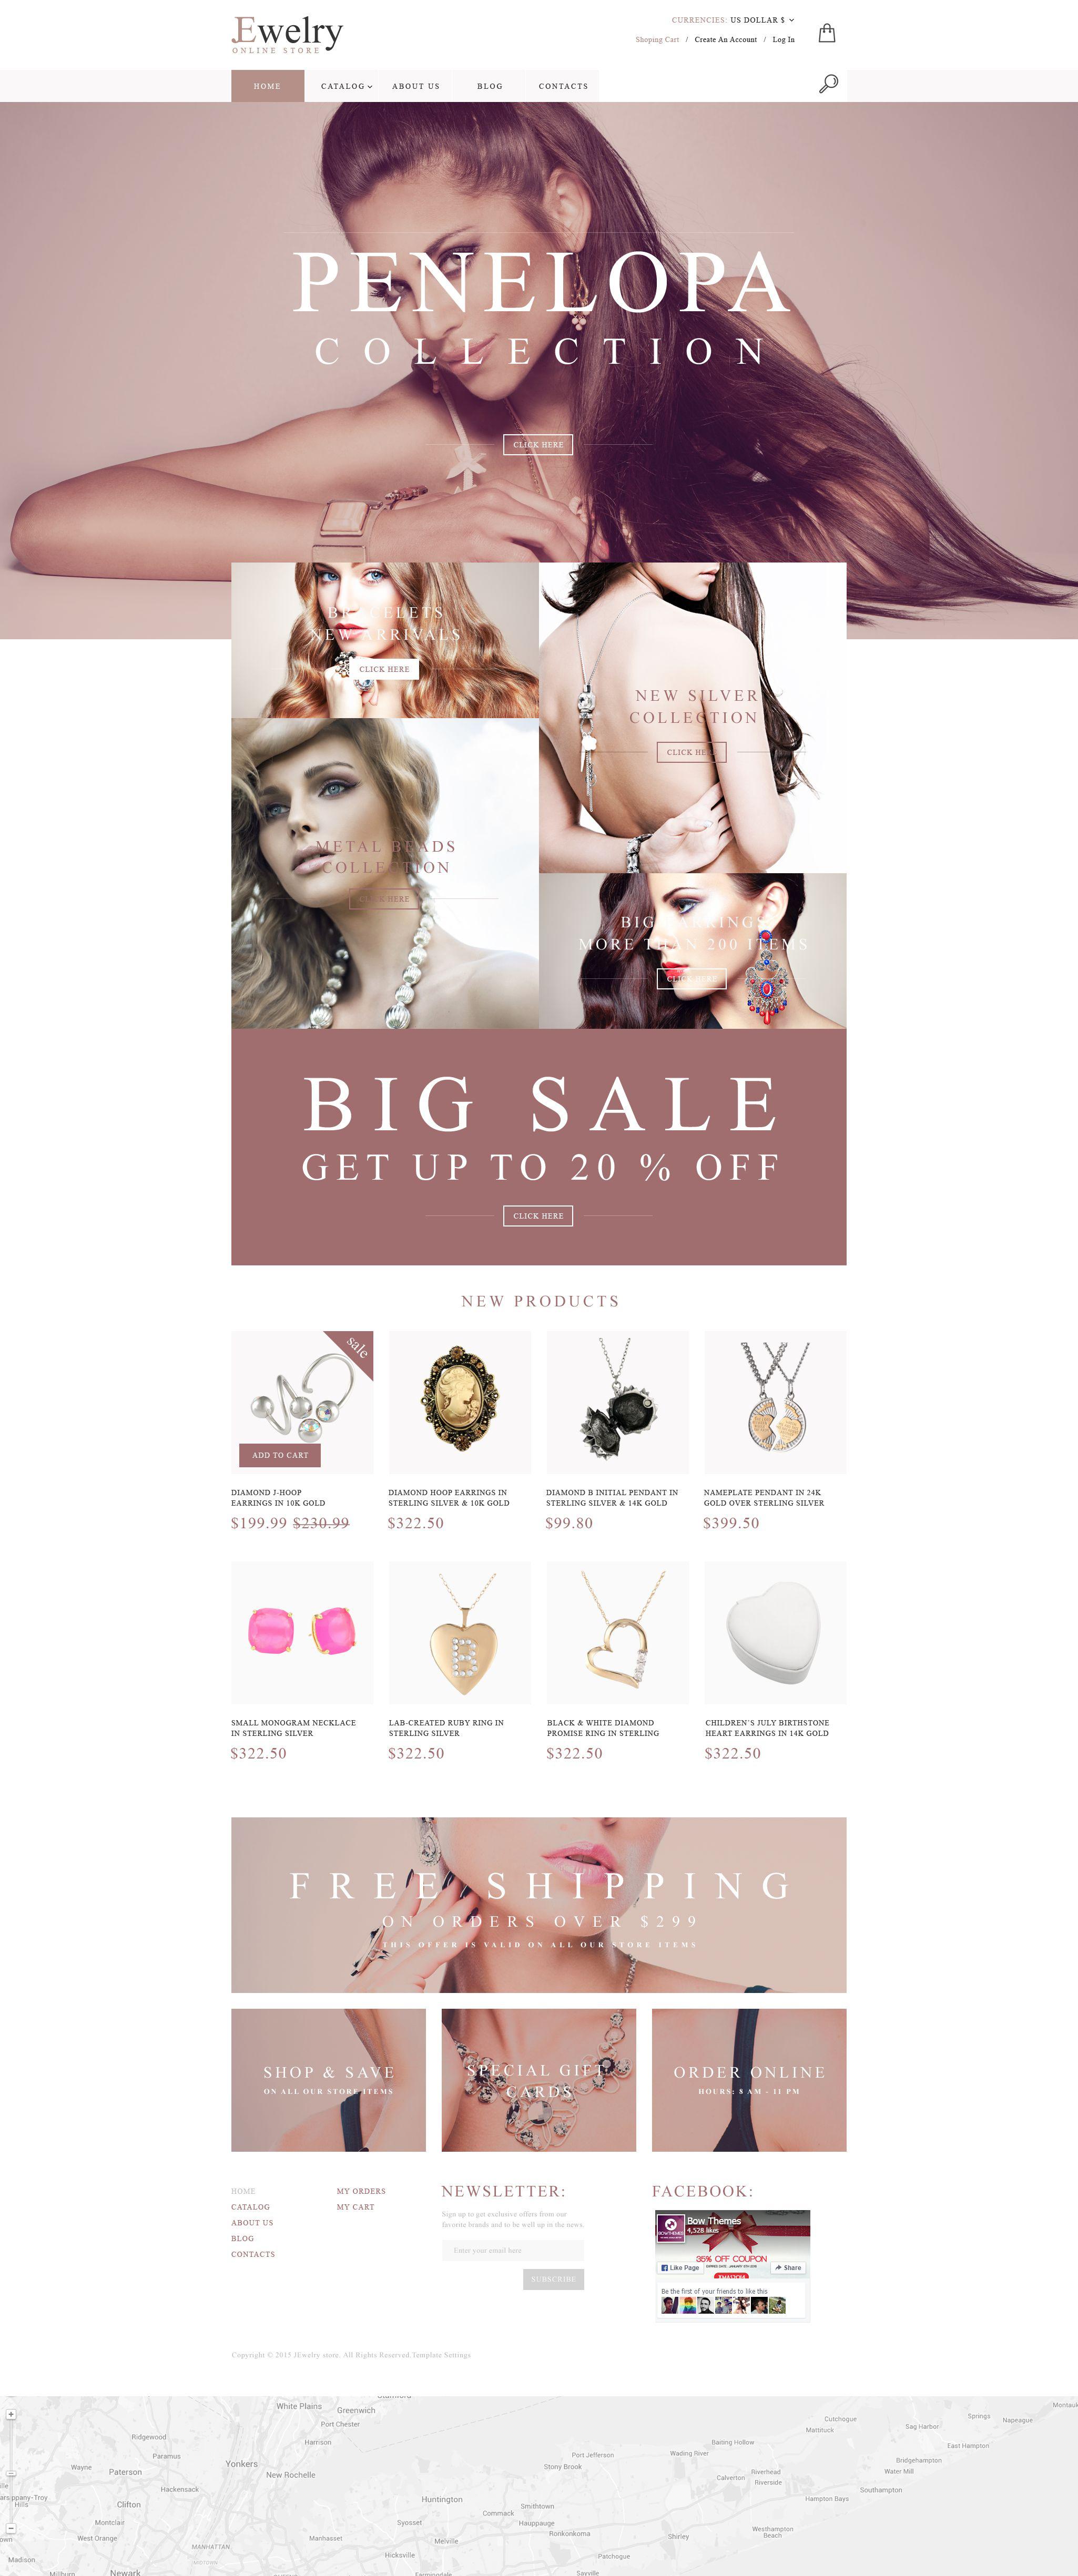 Jewelry House Virtuemart #55430